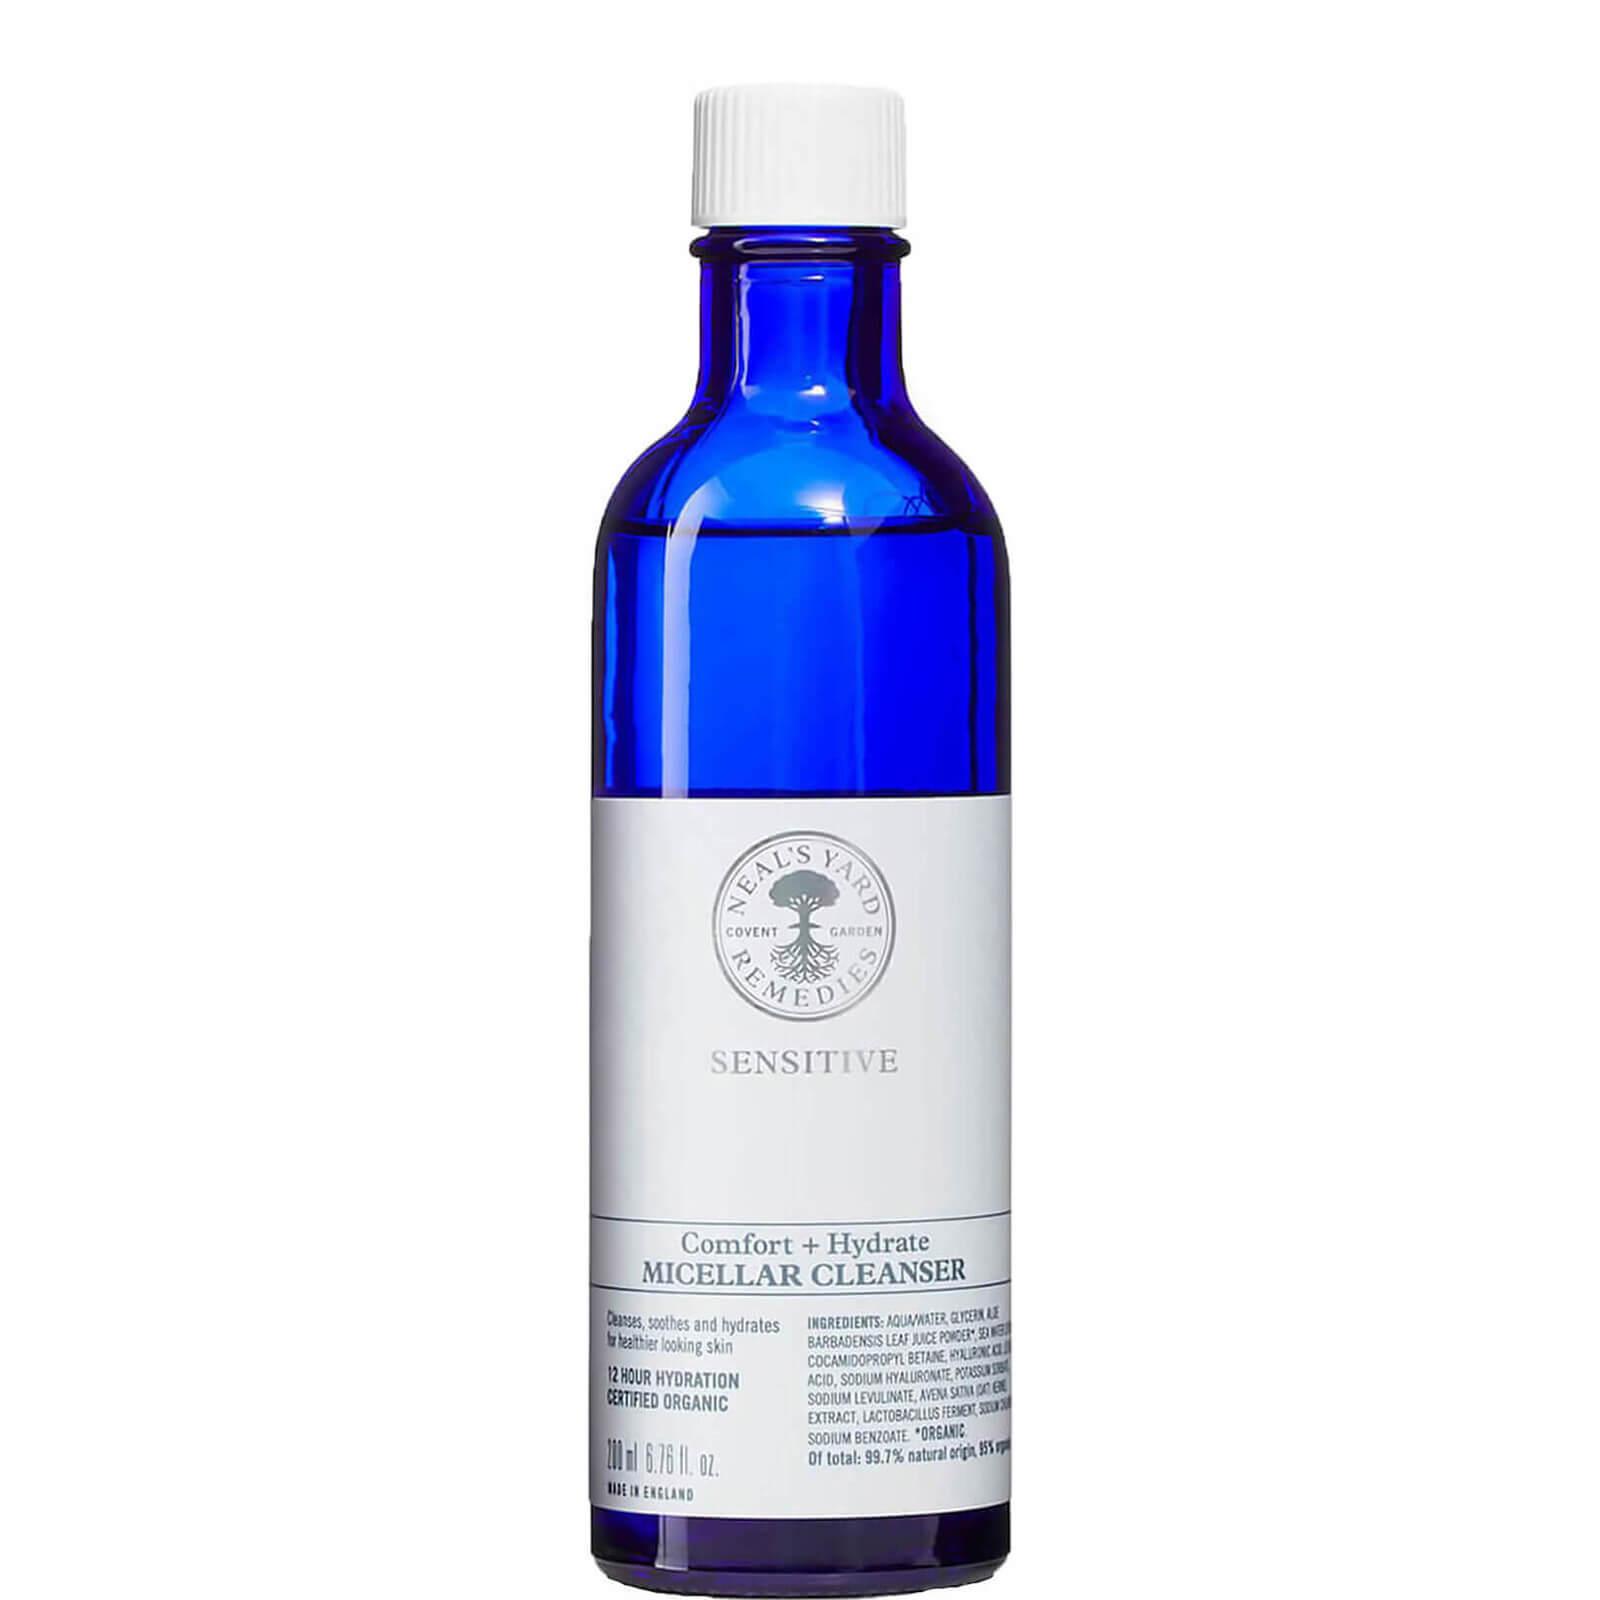 Neal's Yard Remedies Sensitive Comfort + Hydrate Micellar Cleanser 200ml